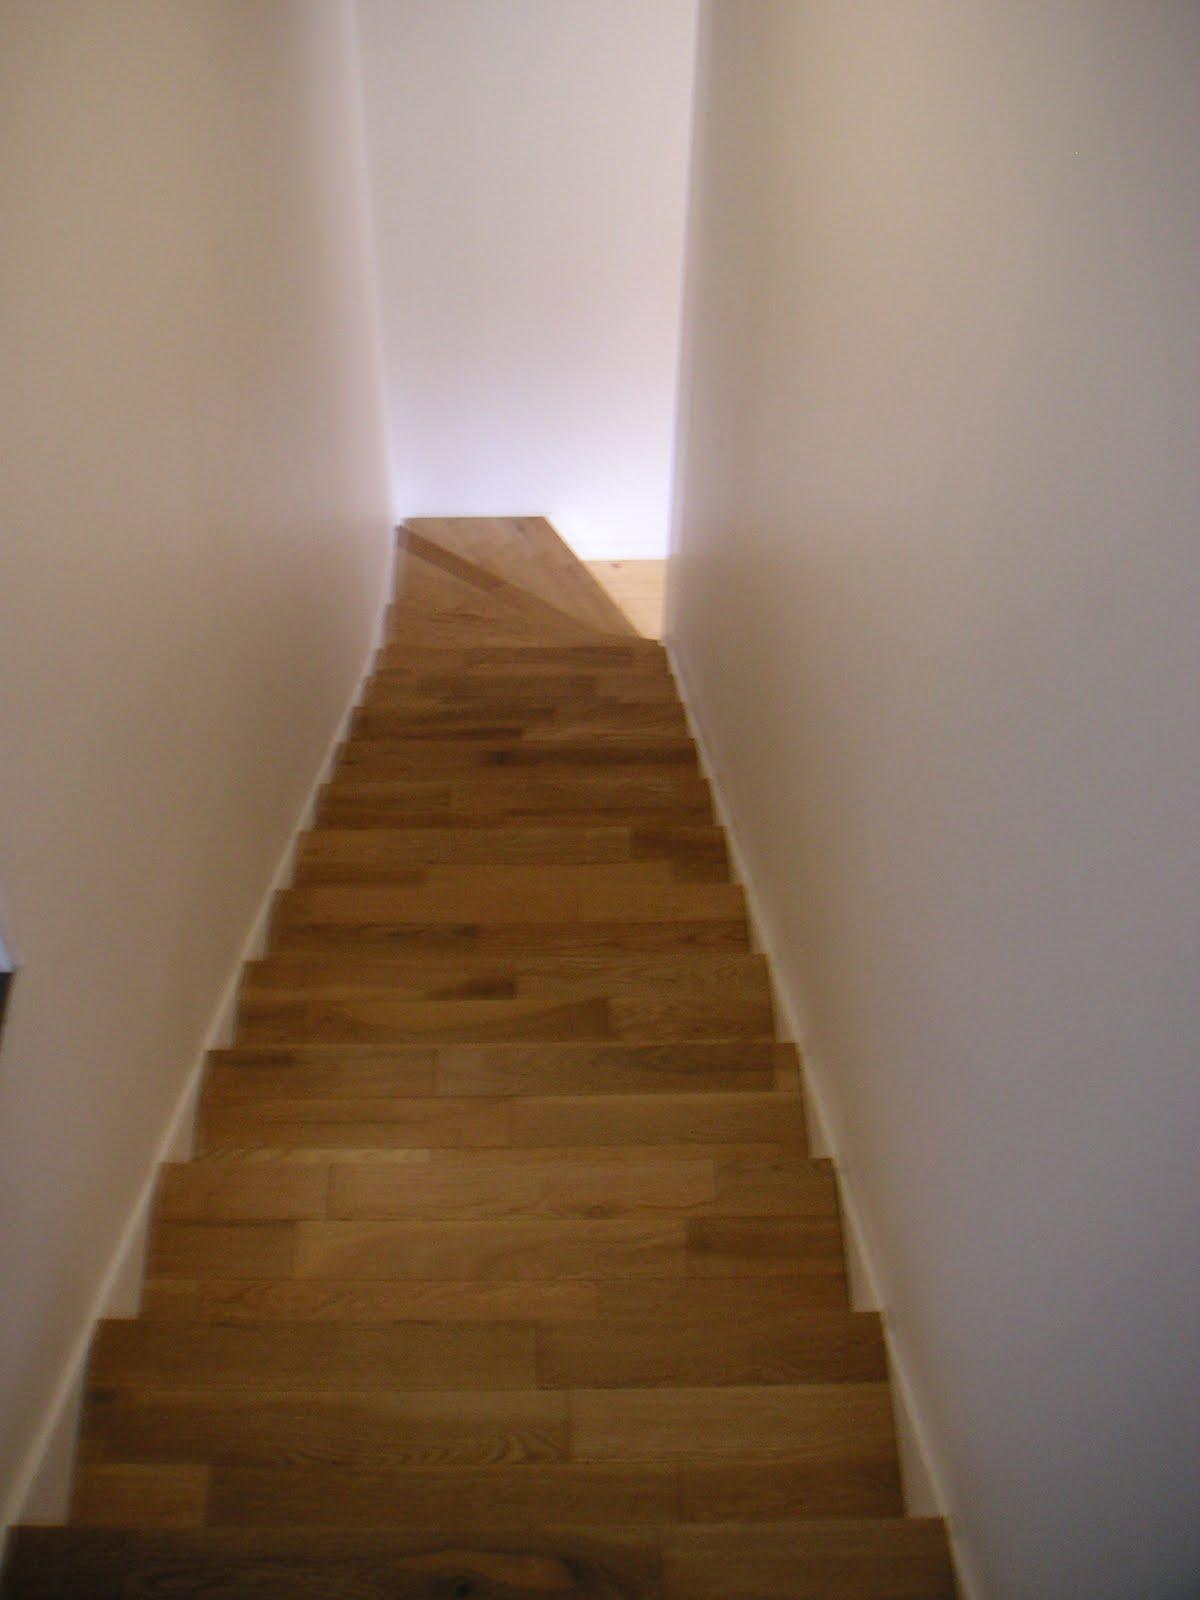 cagibi nantes escalier. Black Bedroom Furniture Sets. Home Design Ideas